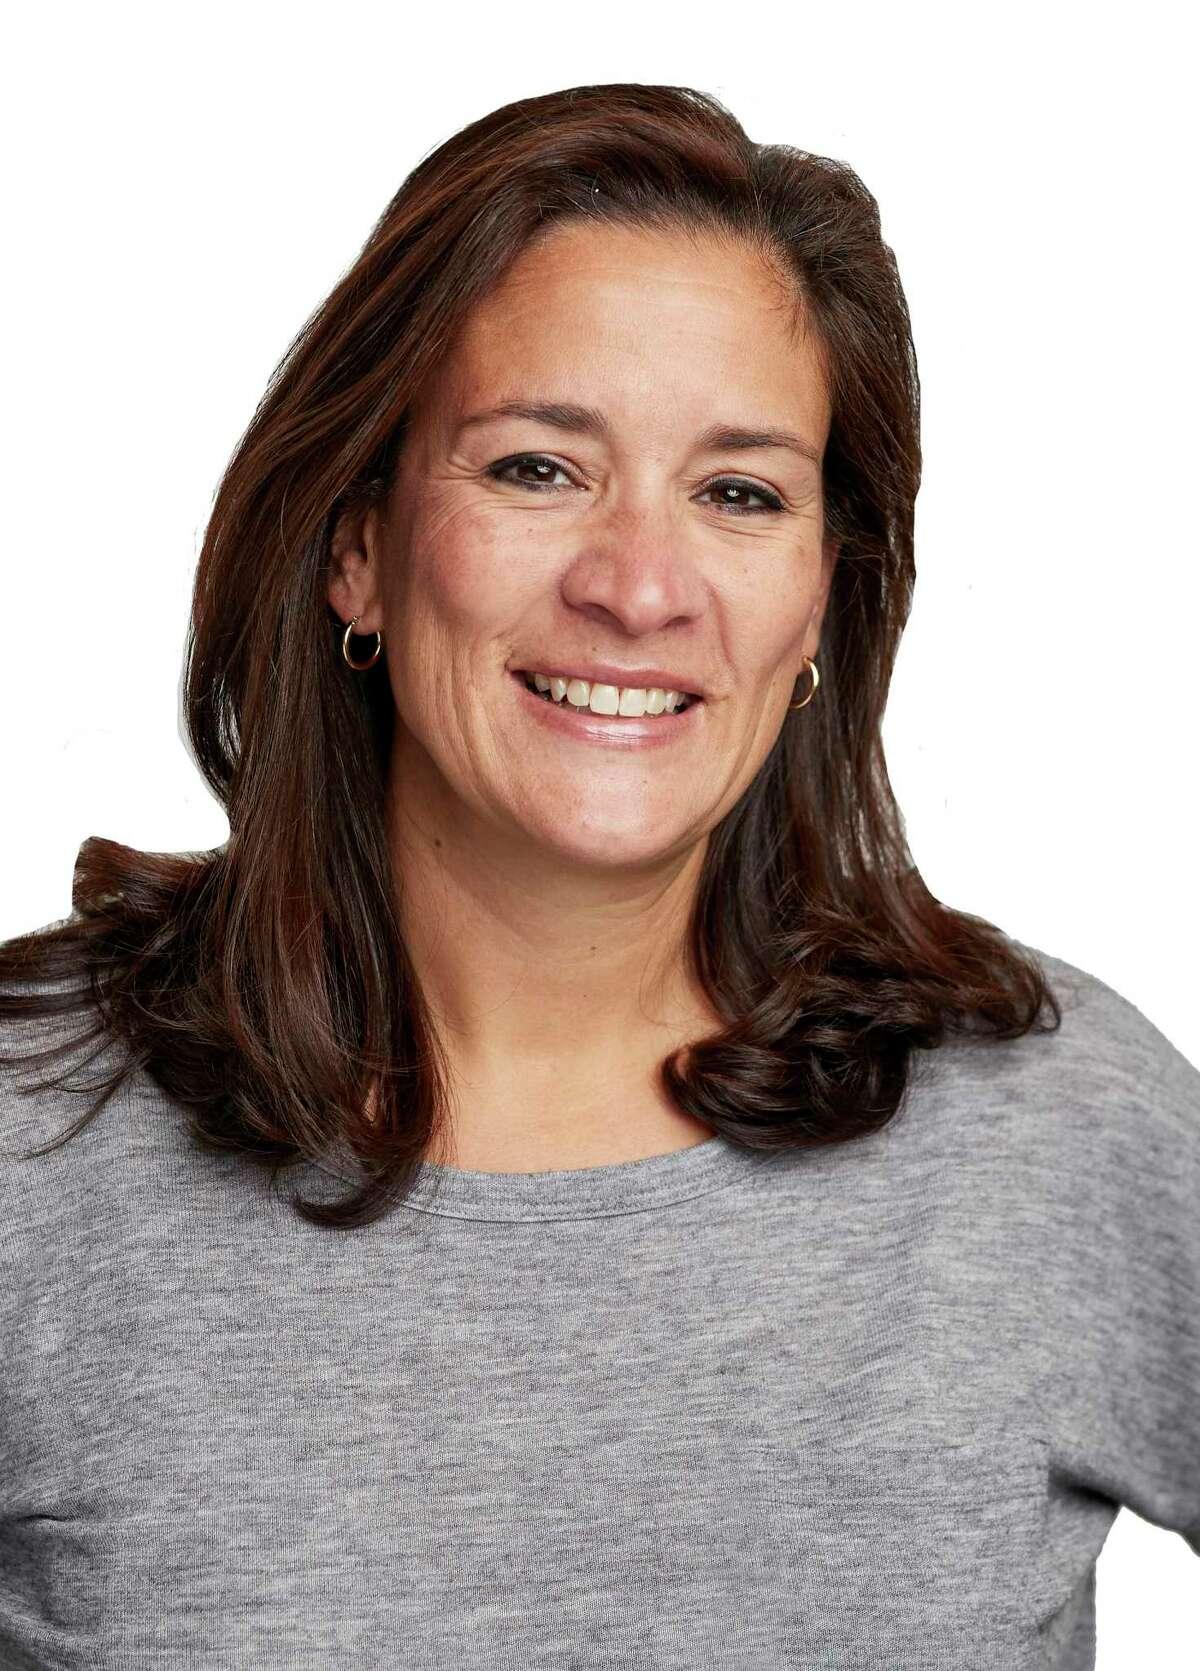 Cristina Vittoria, CEO of the Boys & Girls Club of Greenwich.